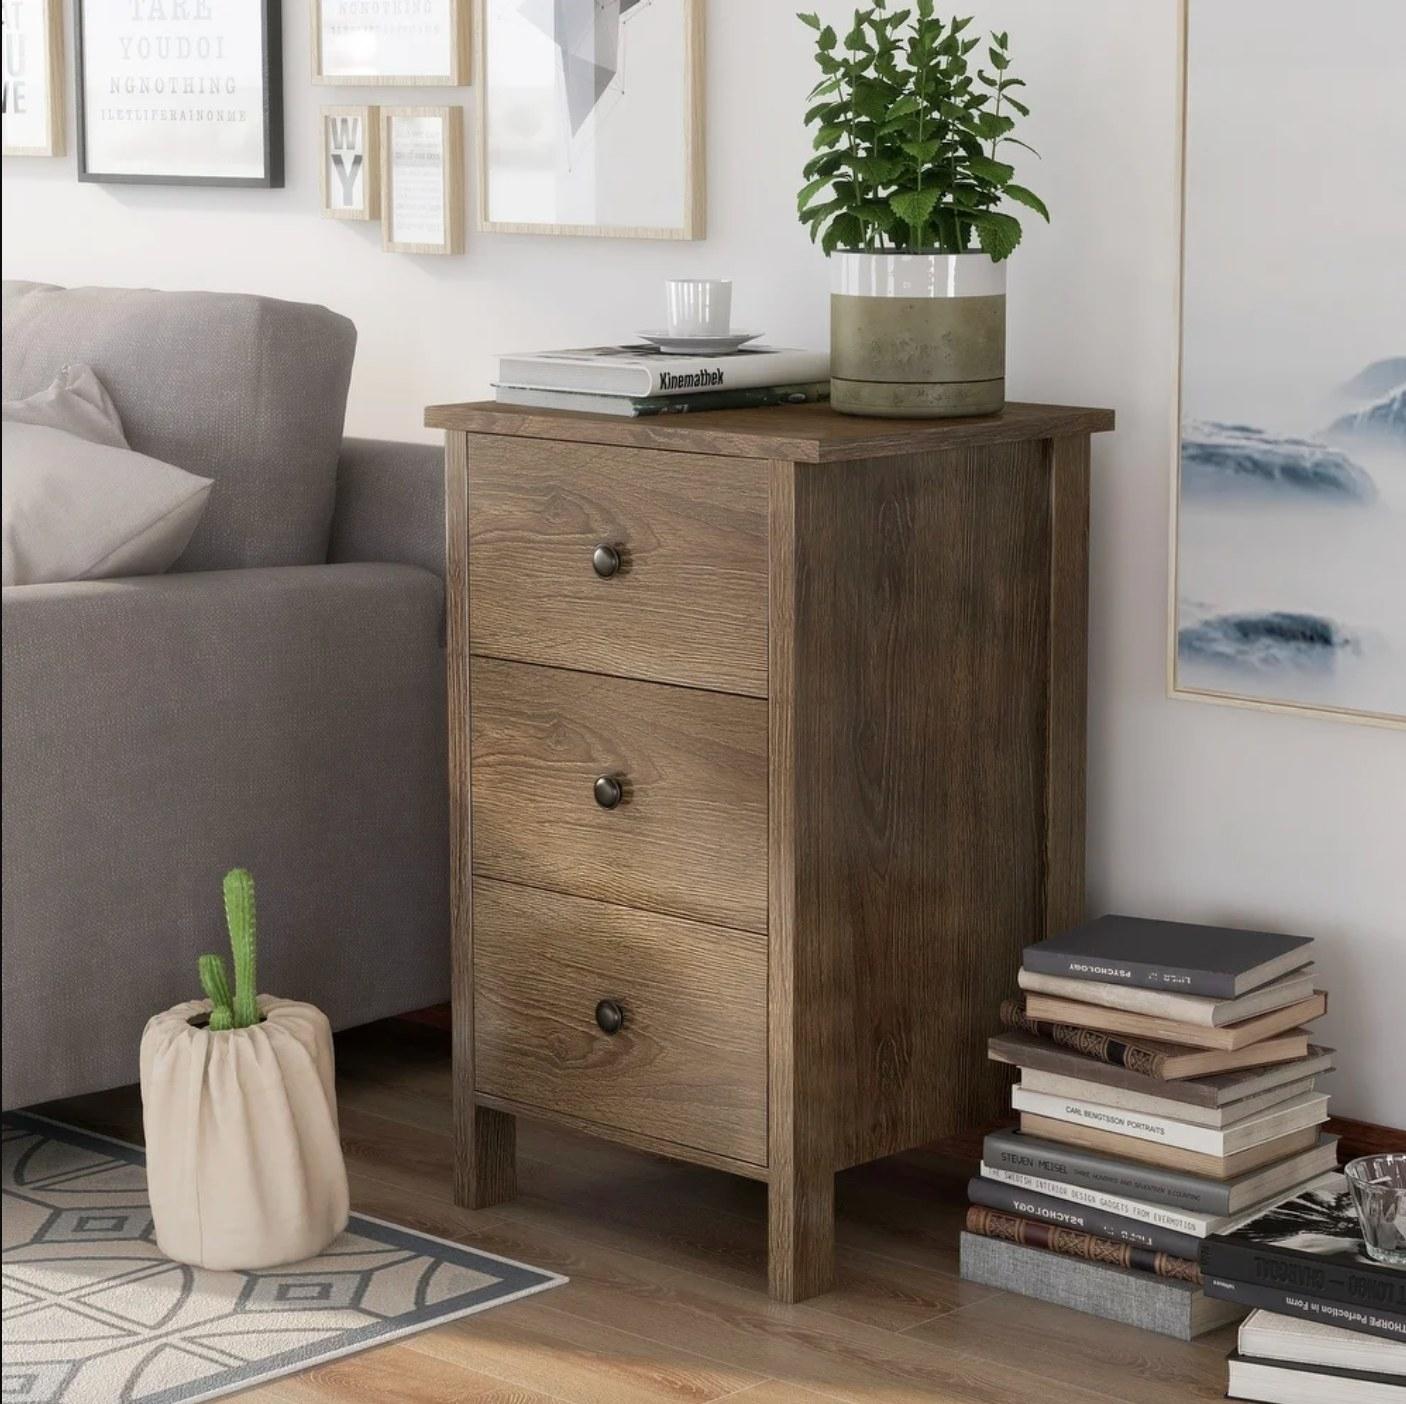 The distressed walnut nightstand